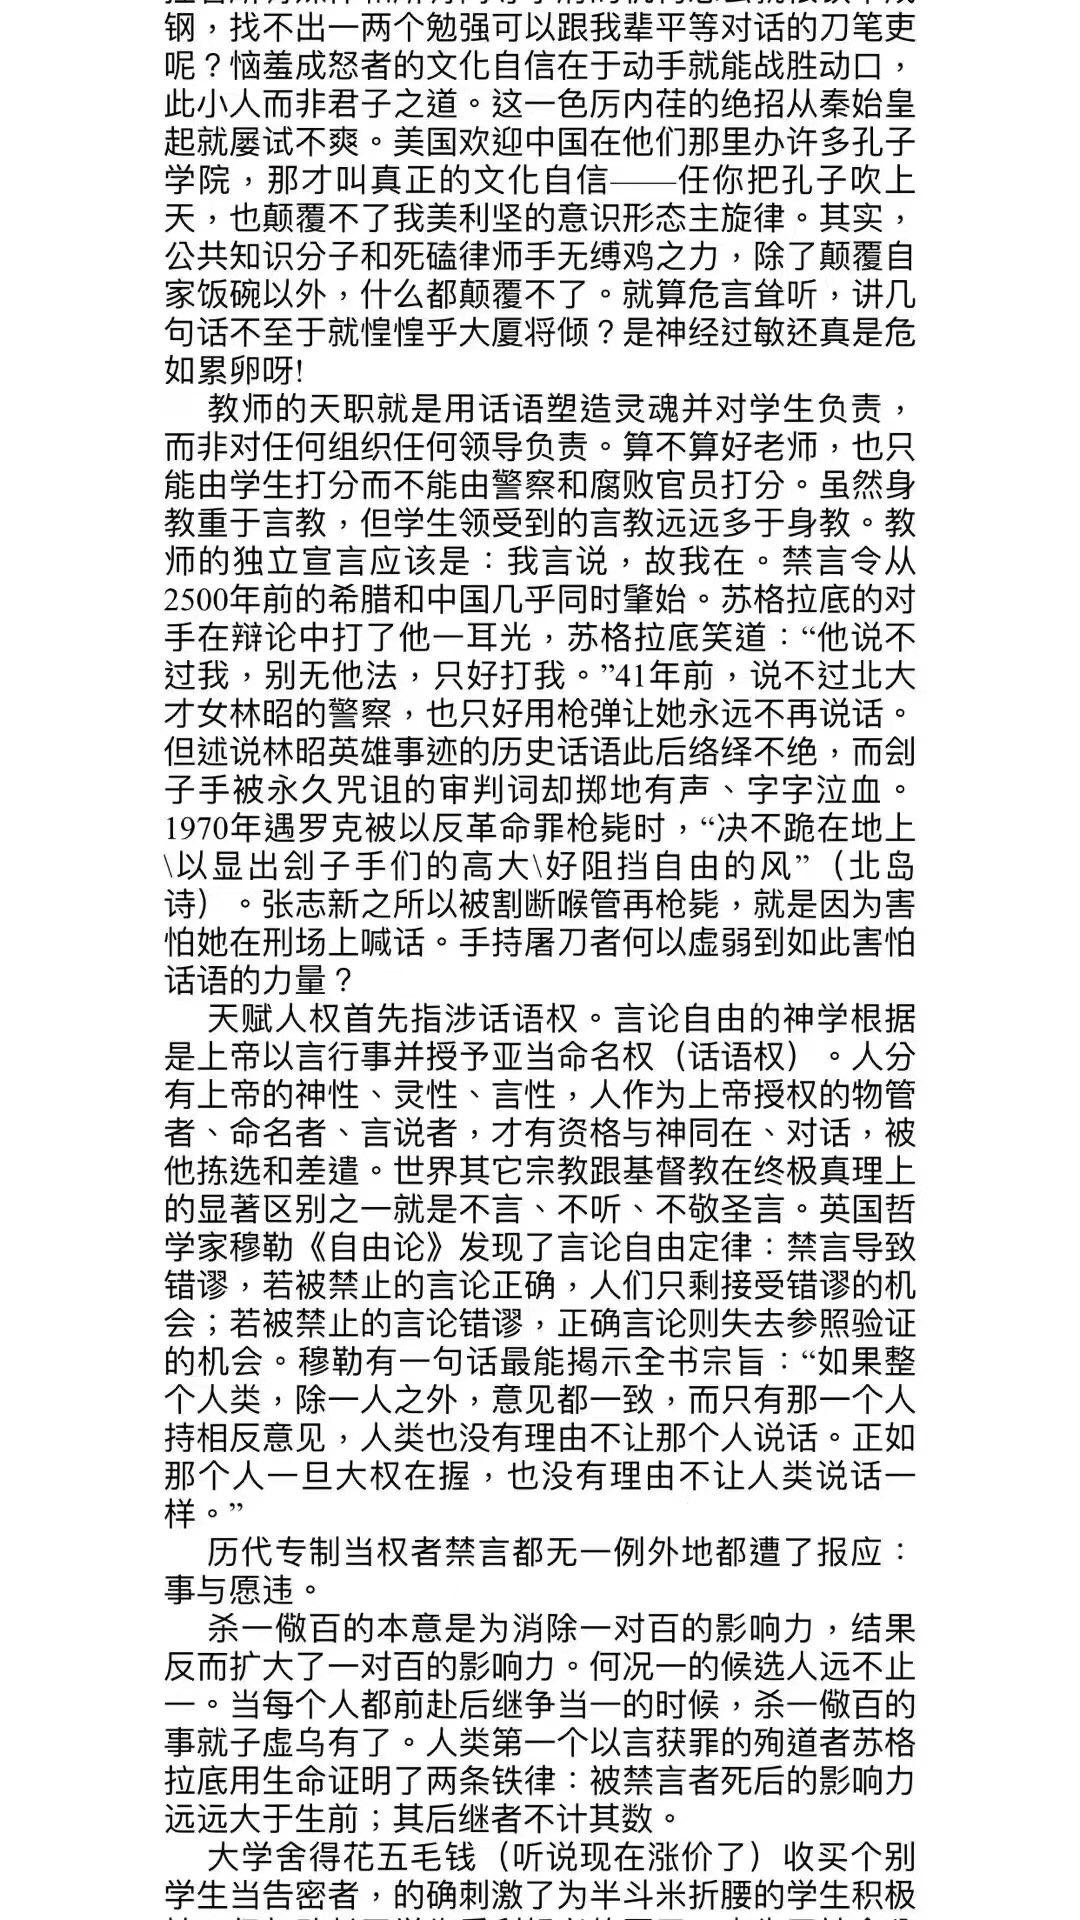 https://pbs.twimg.com/media/D2_xoB5UcAA8-ca?format=jpg&name=orig